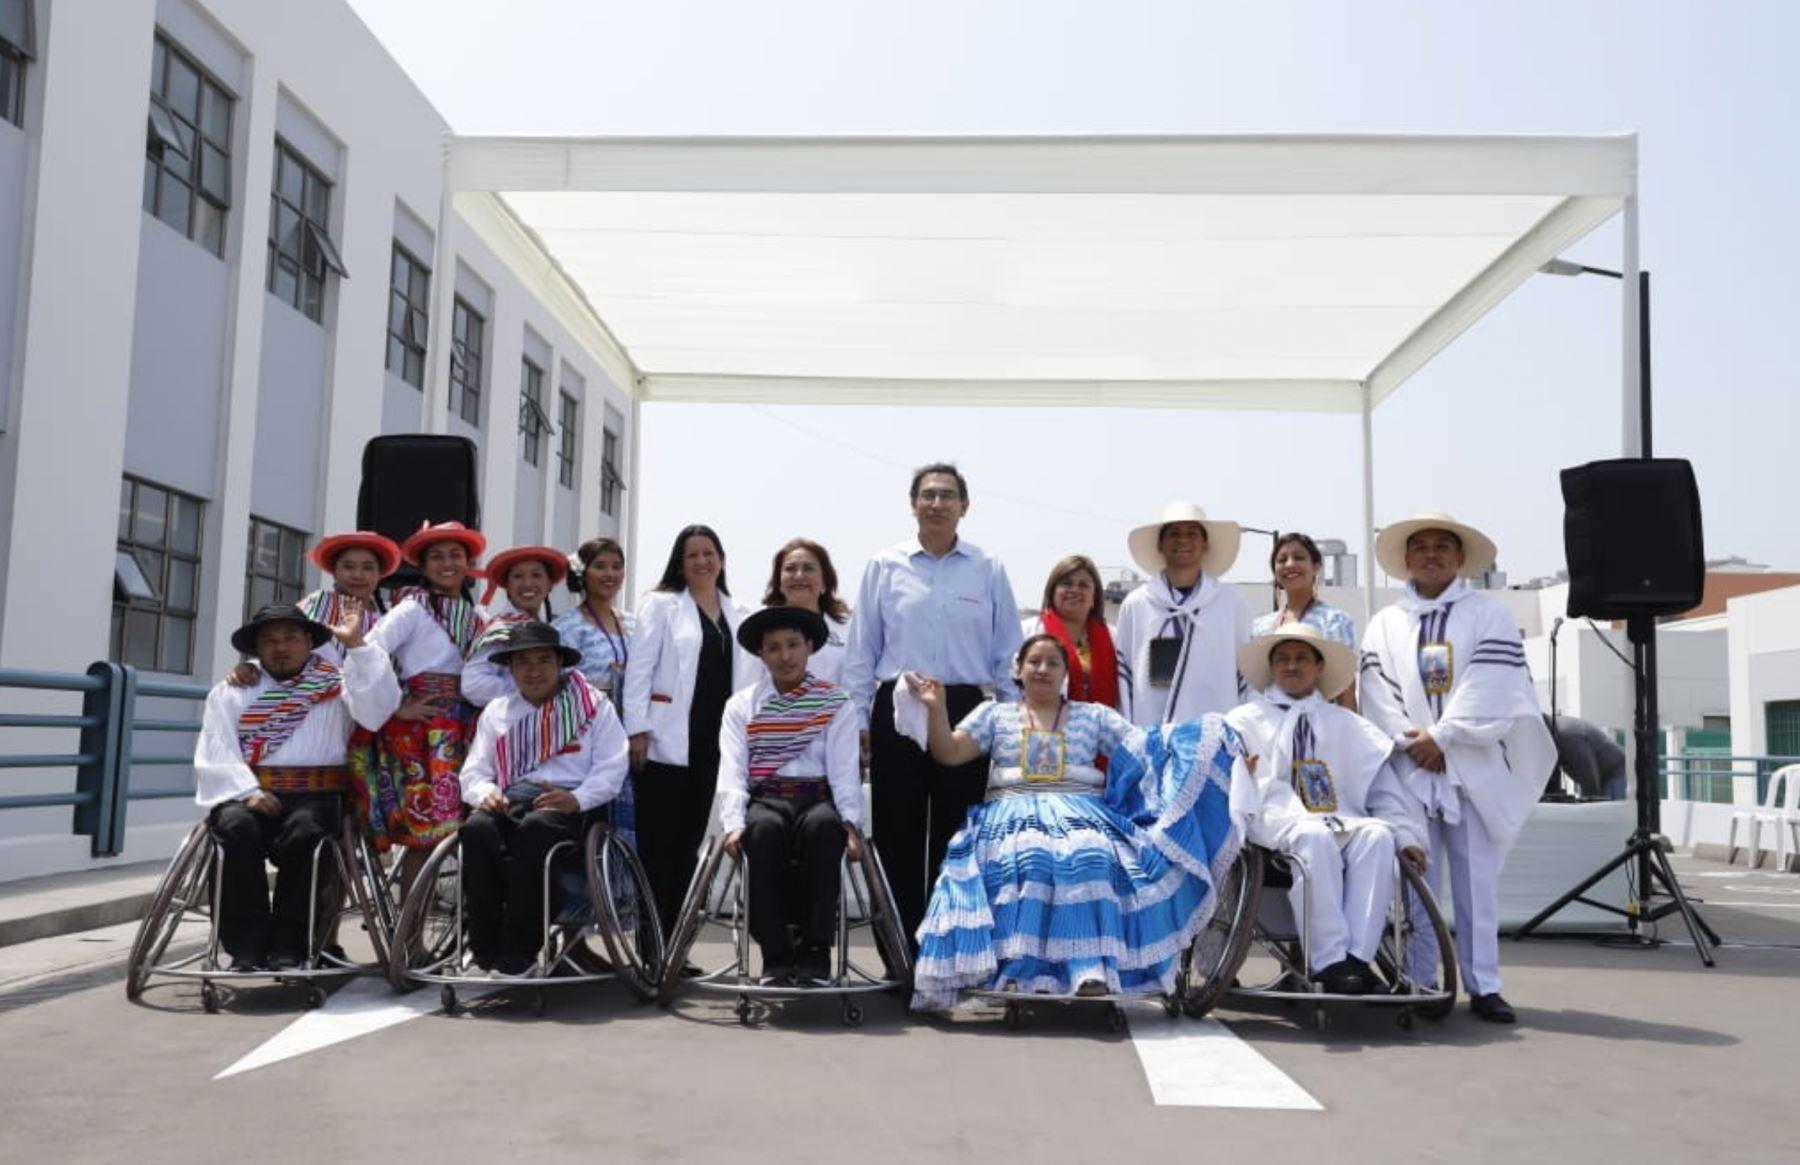 Presidente Martin Vizcarra inaugura la ampliación del Instituto Nacional de Rehabilitación en Chorrillos. Foto: ANDINA/Prensa Presidencia